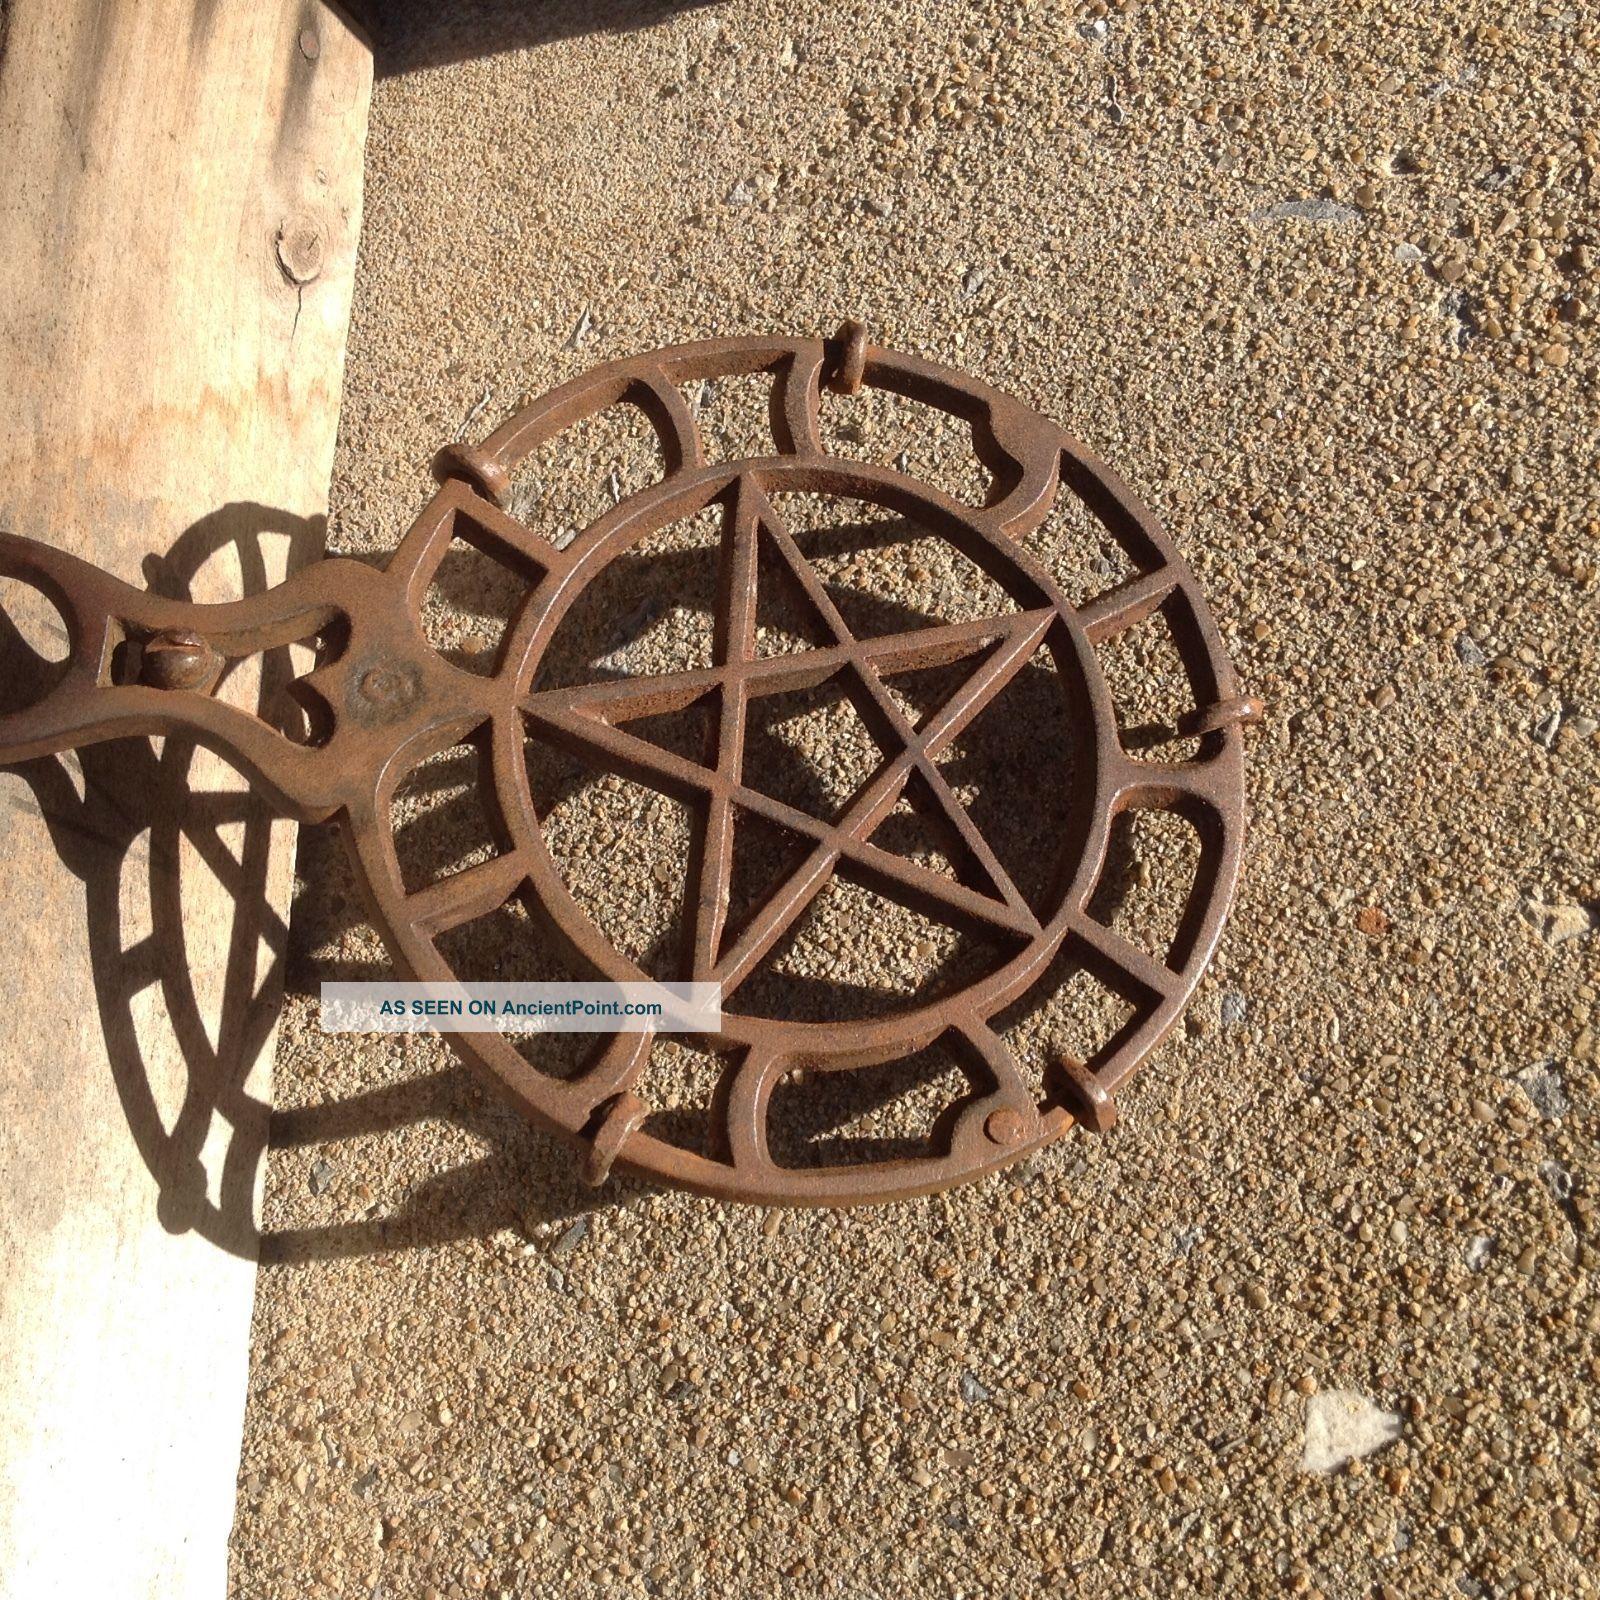 Cast Iron Trivet Wall Hanging Vintage Star Pentagram Heart Griswold? Footed Trivets photo